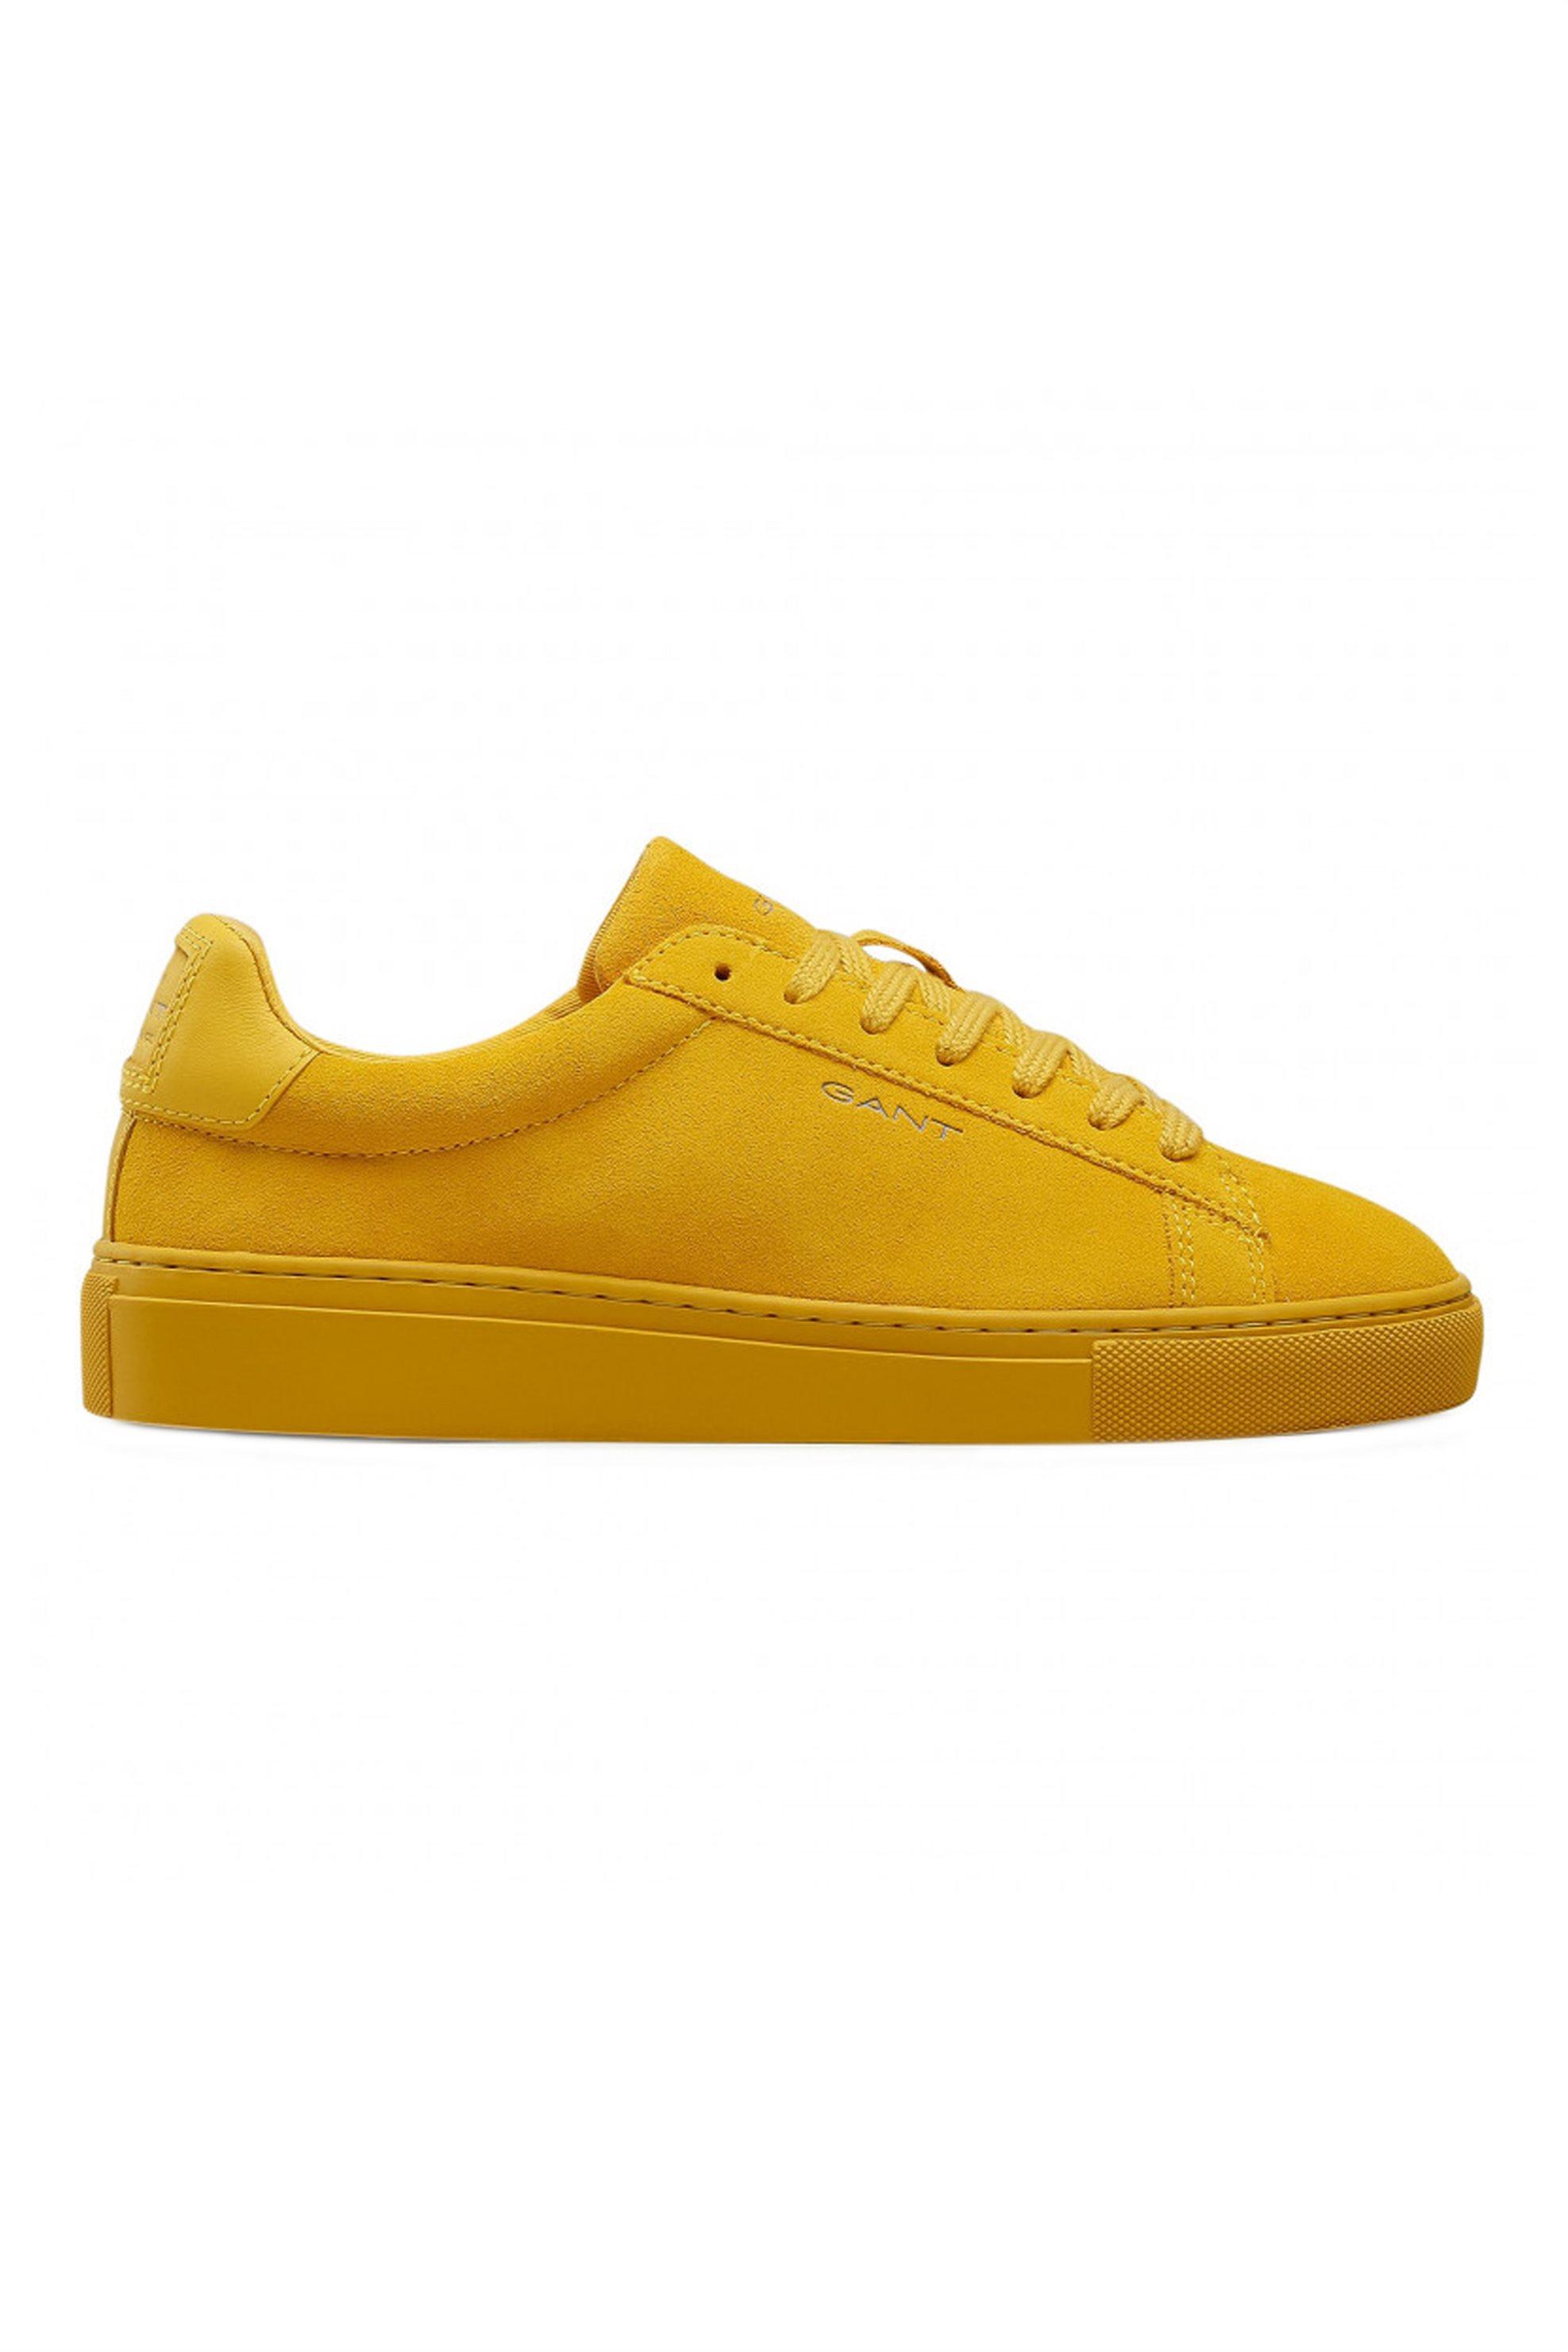 "Gant ανδρικά sneakers suede με κορδόνια ""Mc Julien"" – 22633653 – Κίτρινο"